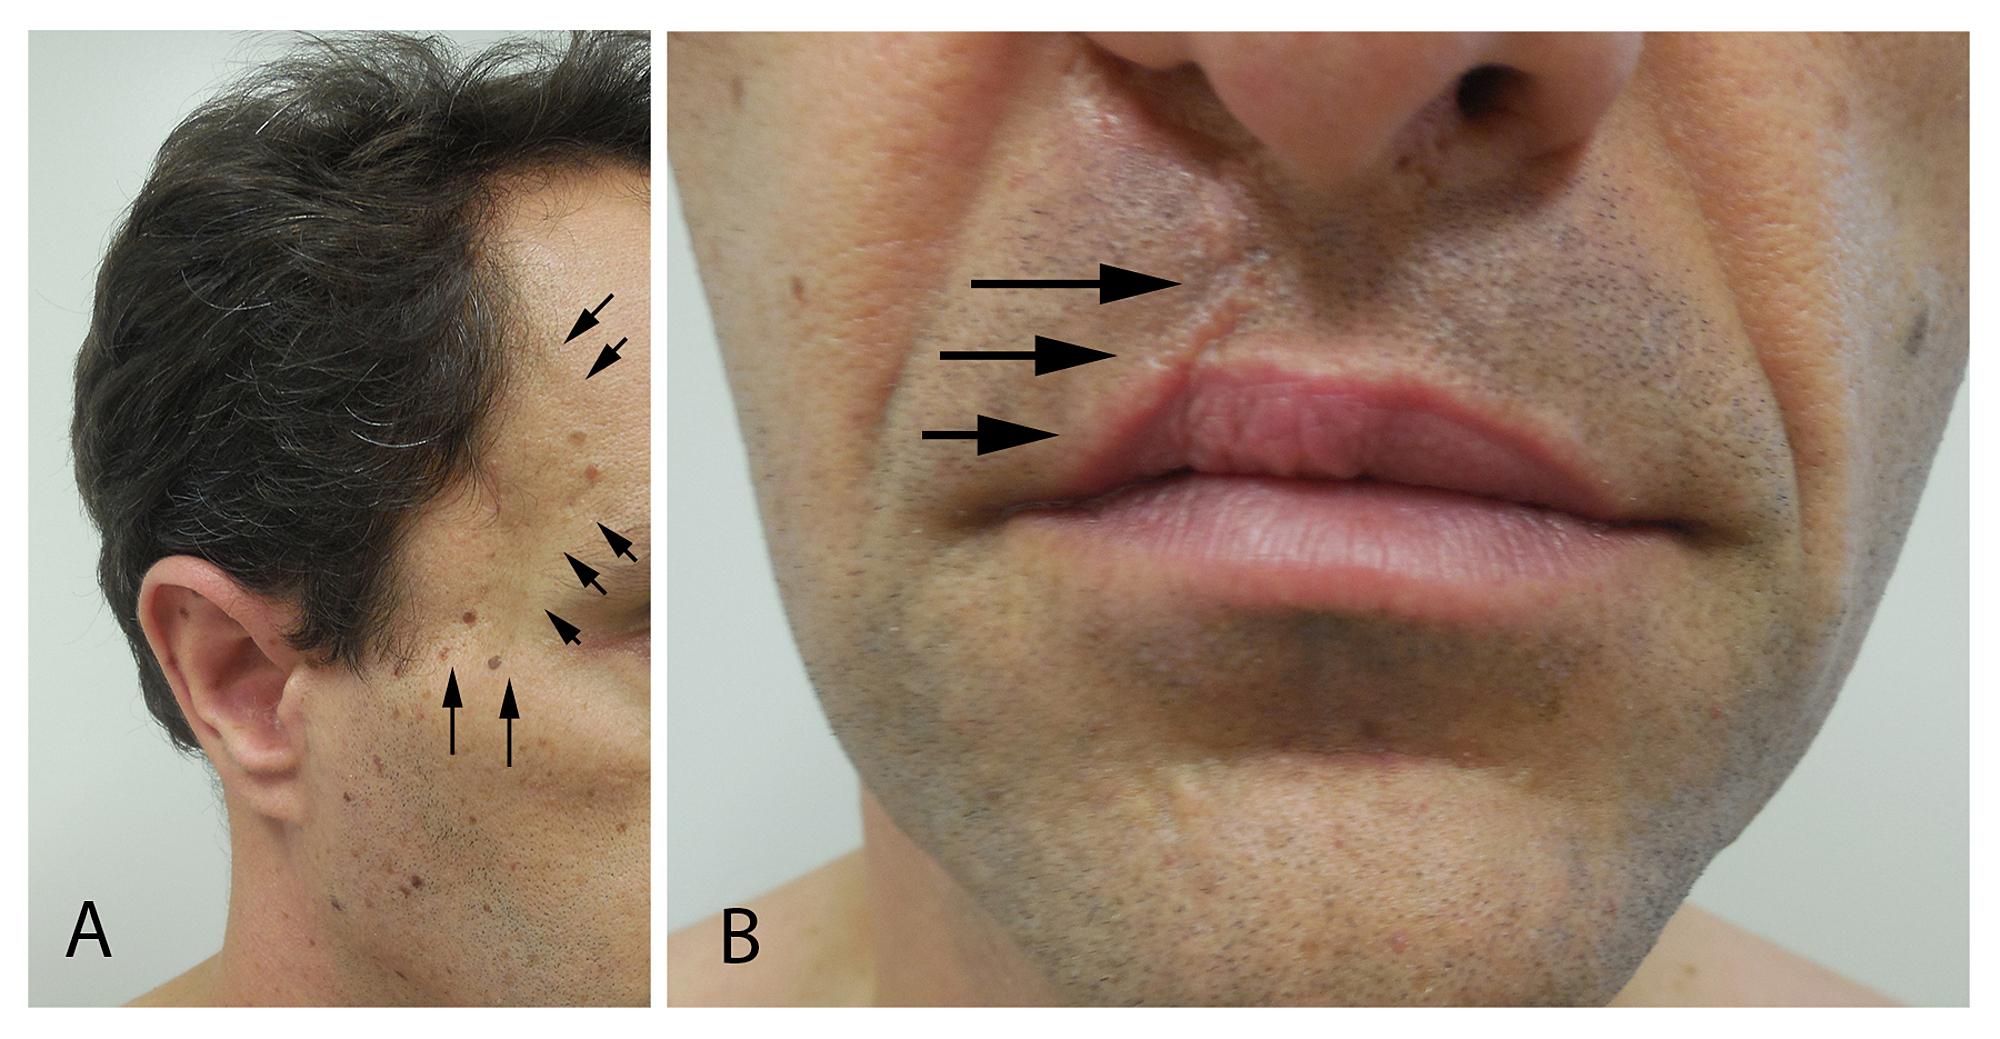 cureus | a man with juvenile nasopharyngeal angiofibroma, vestibular